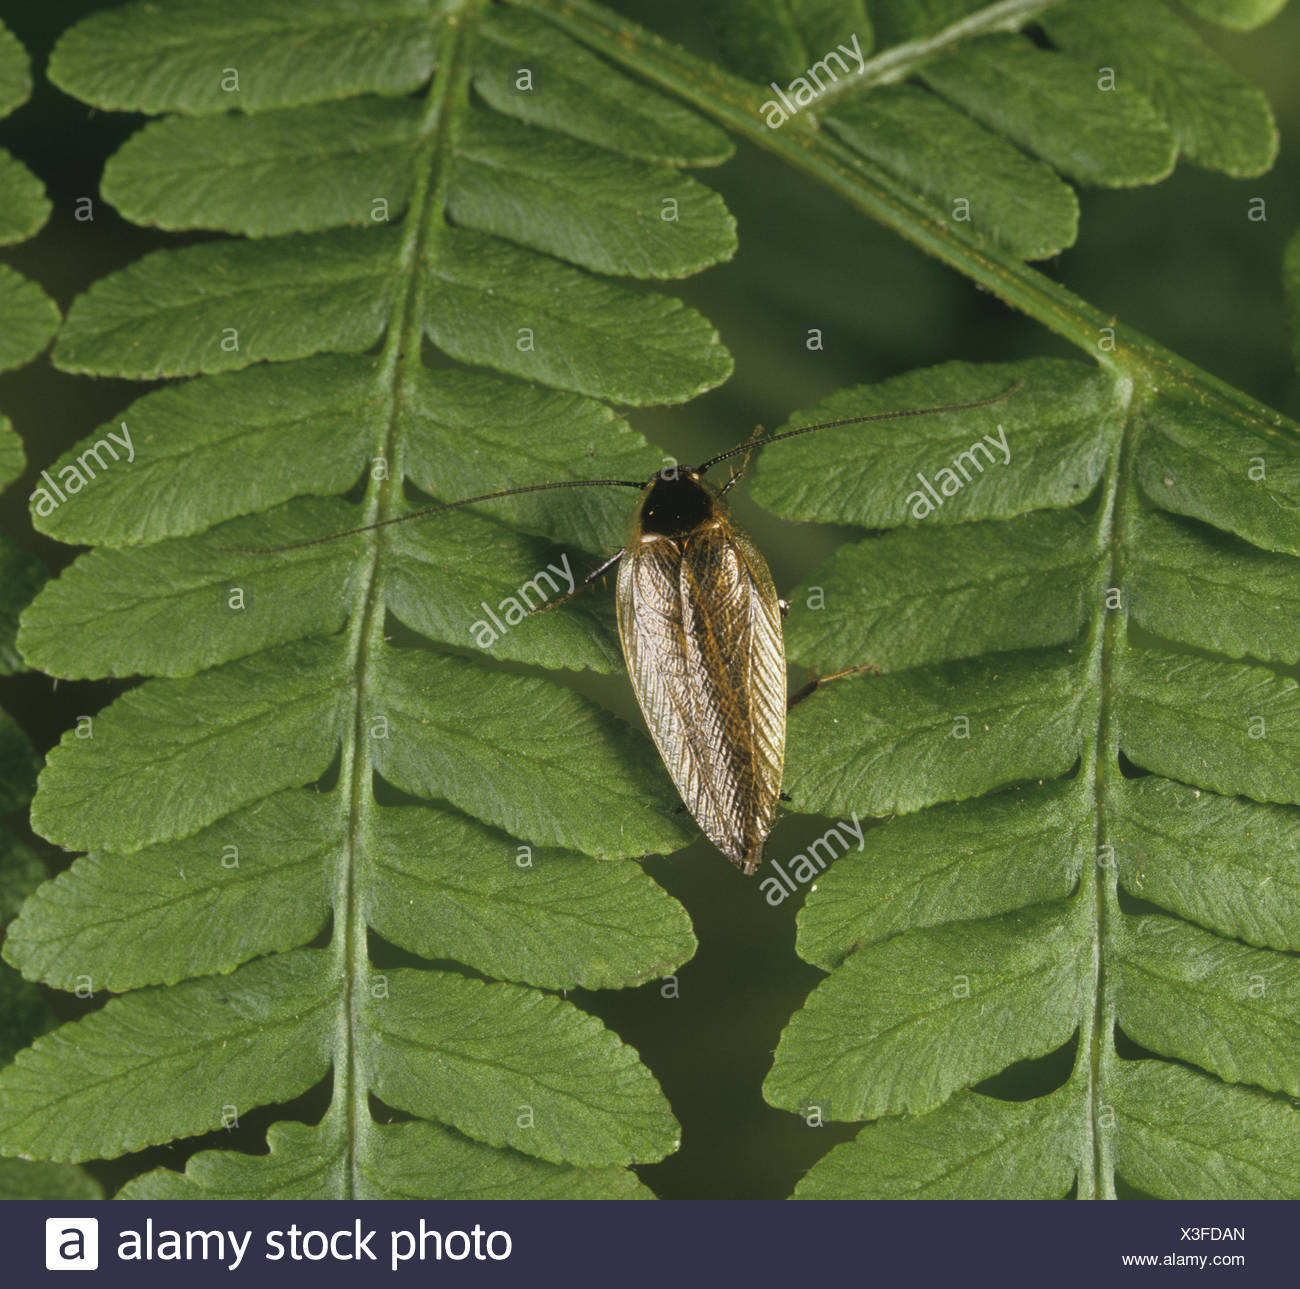 Dusky Cockroach - Ectobius lapponicus - Stock Image